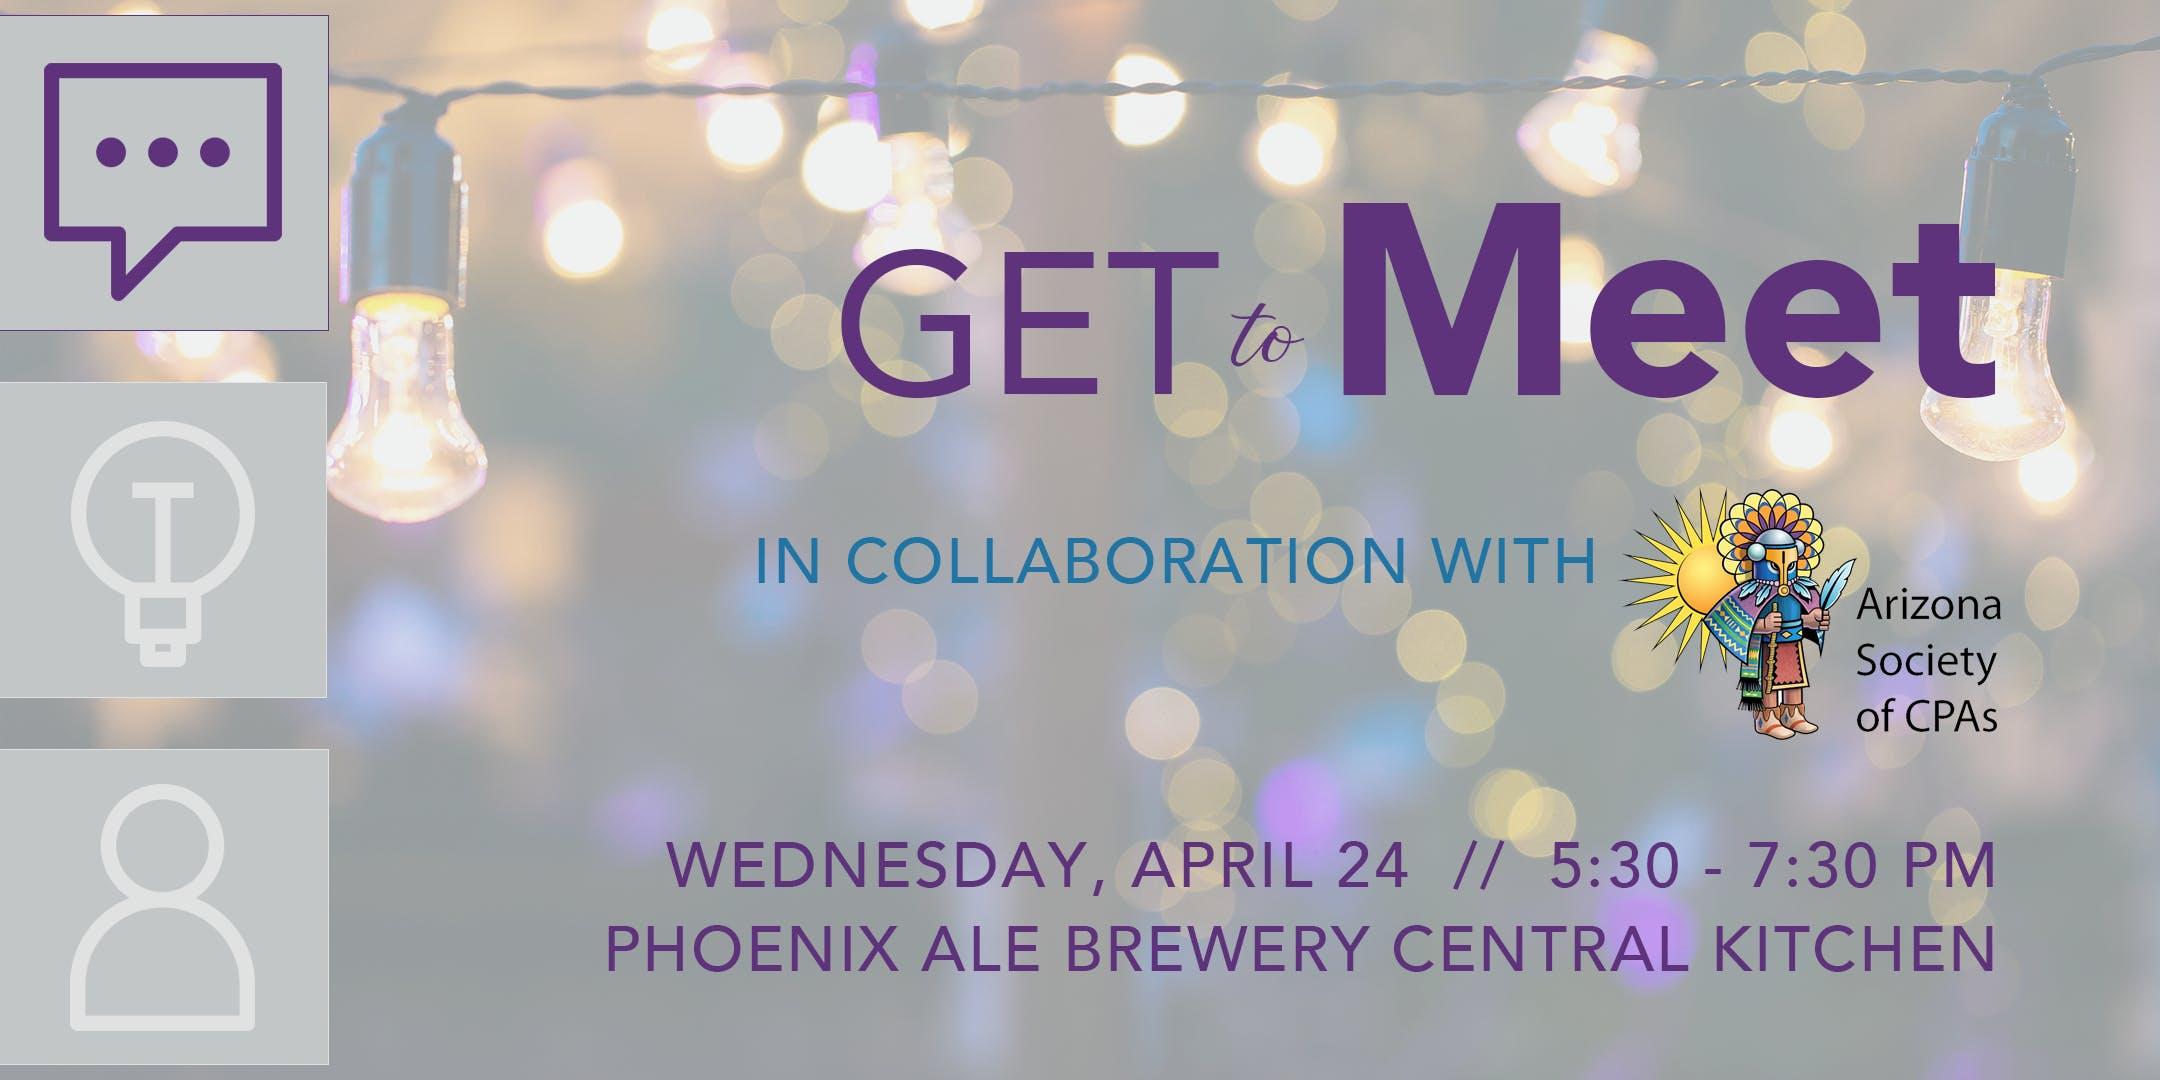 GET to Meet: Phoenix Ale Brewery Central Kitchen